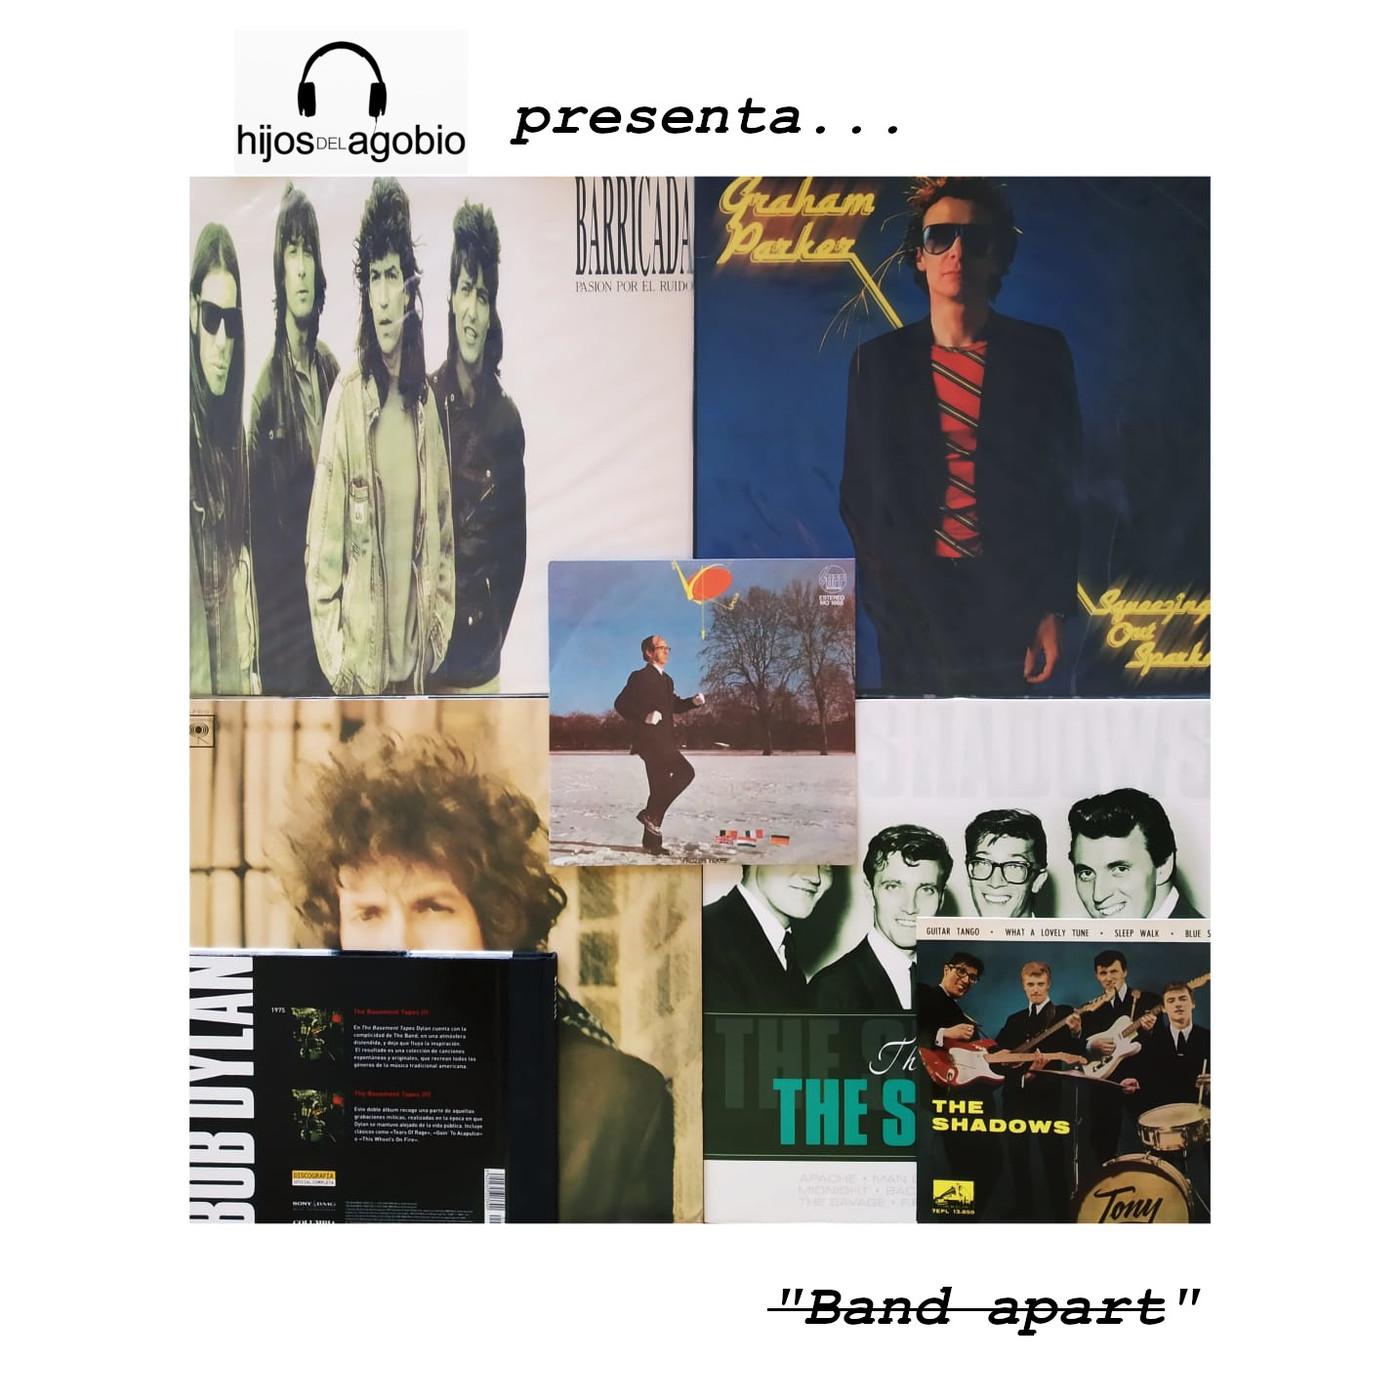 Bands apart (27/03/2020)